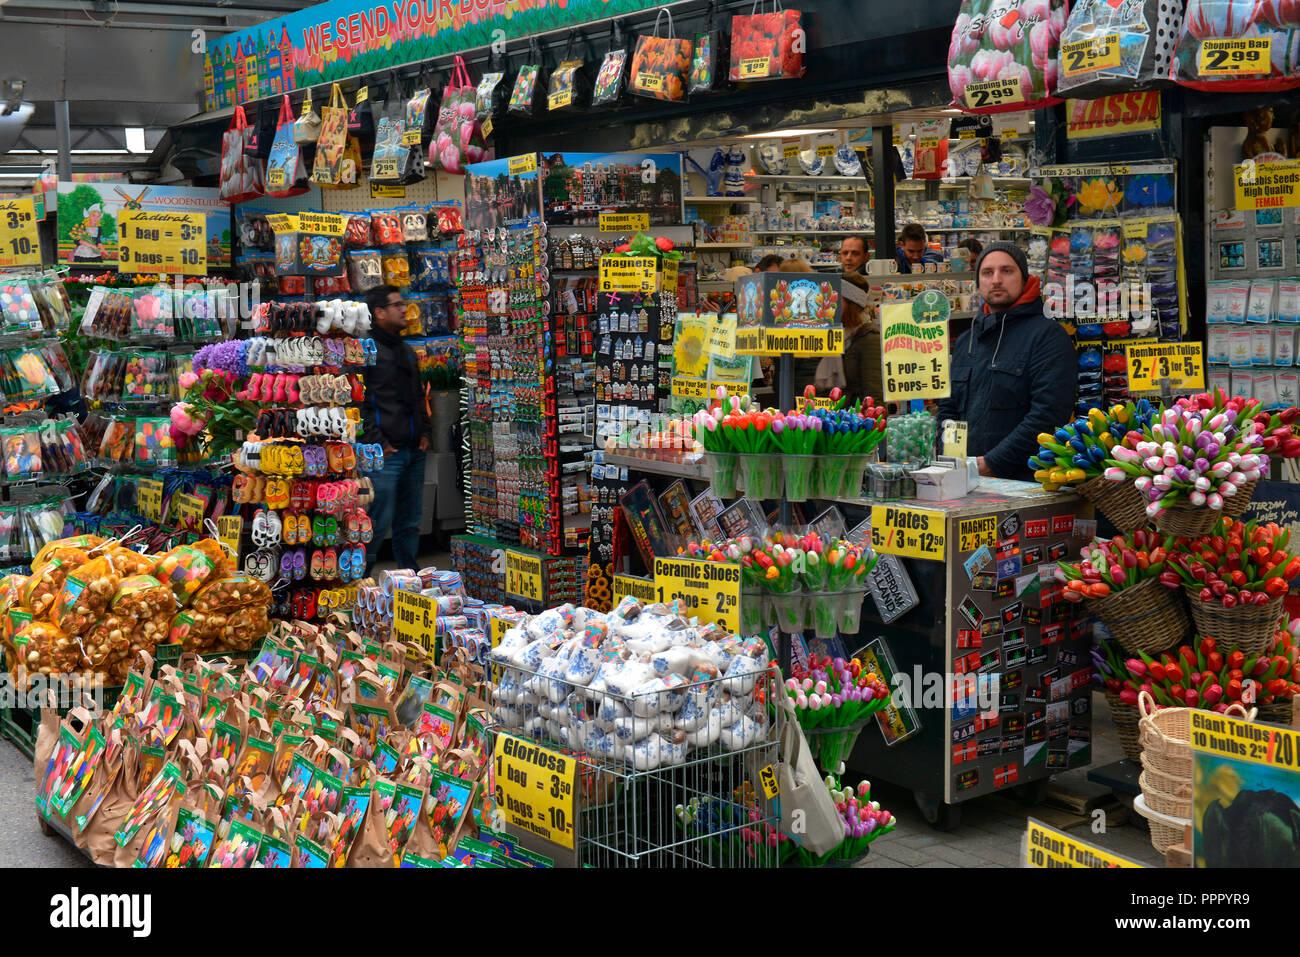 Bloemenmarkt, Singel, Amsterdam, Niederlande Stock Photo